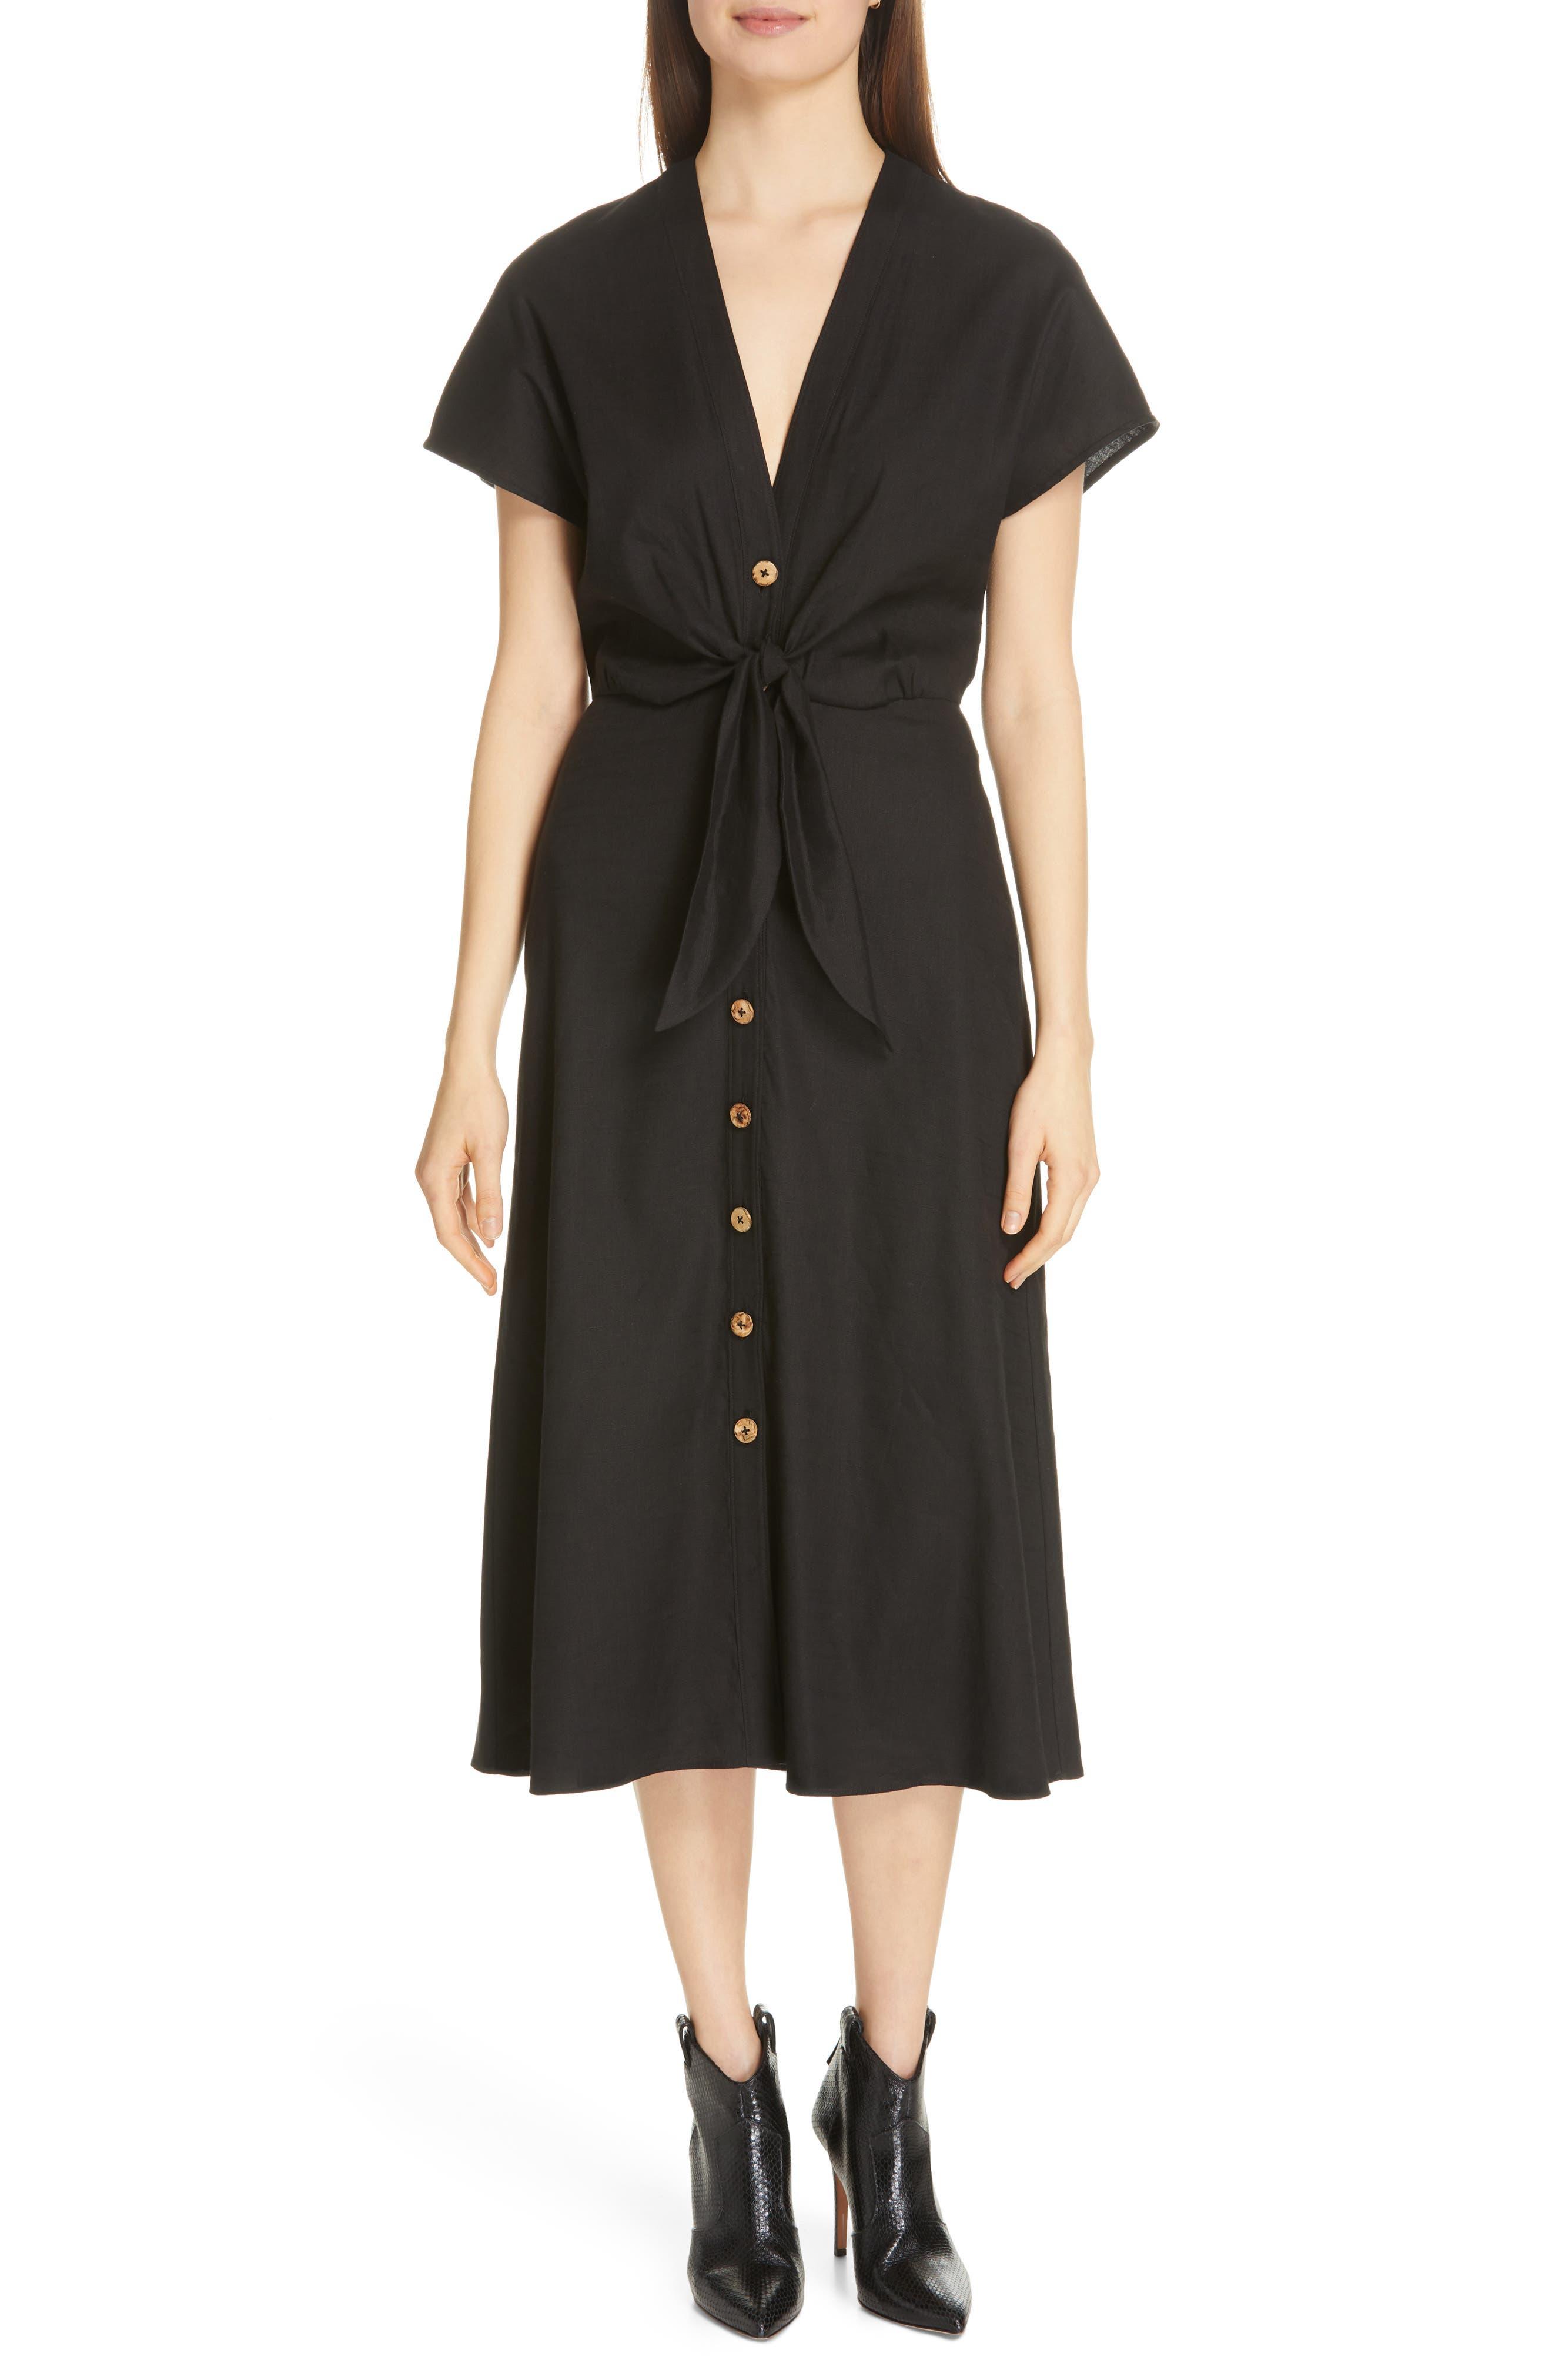 VERONICA BEARD, Giana Tie Waist Linen Blend Midi Dress, Main thumbnail 1, color, BLACK